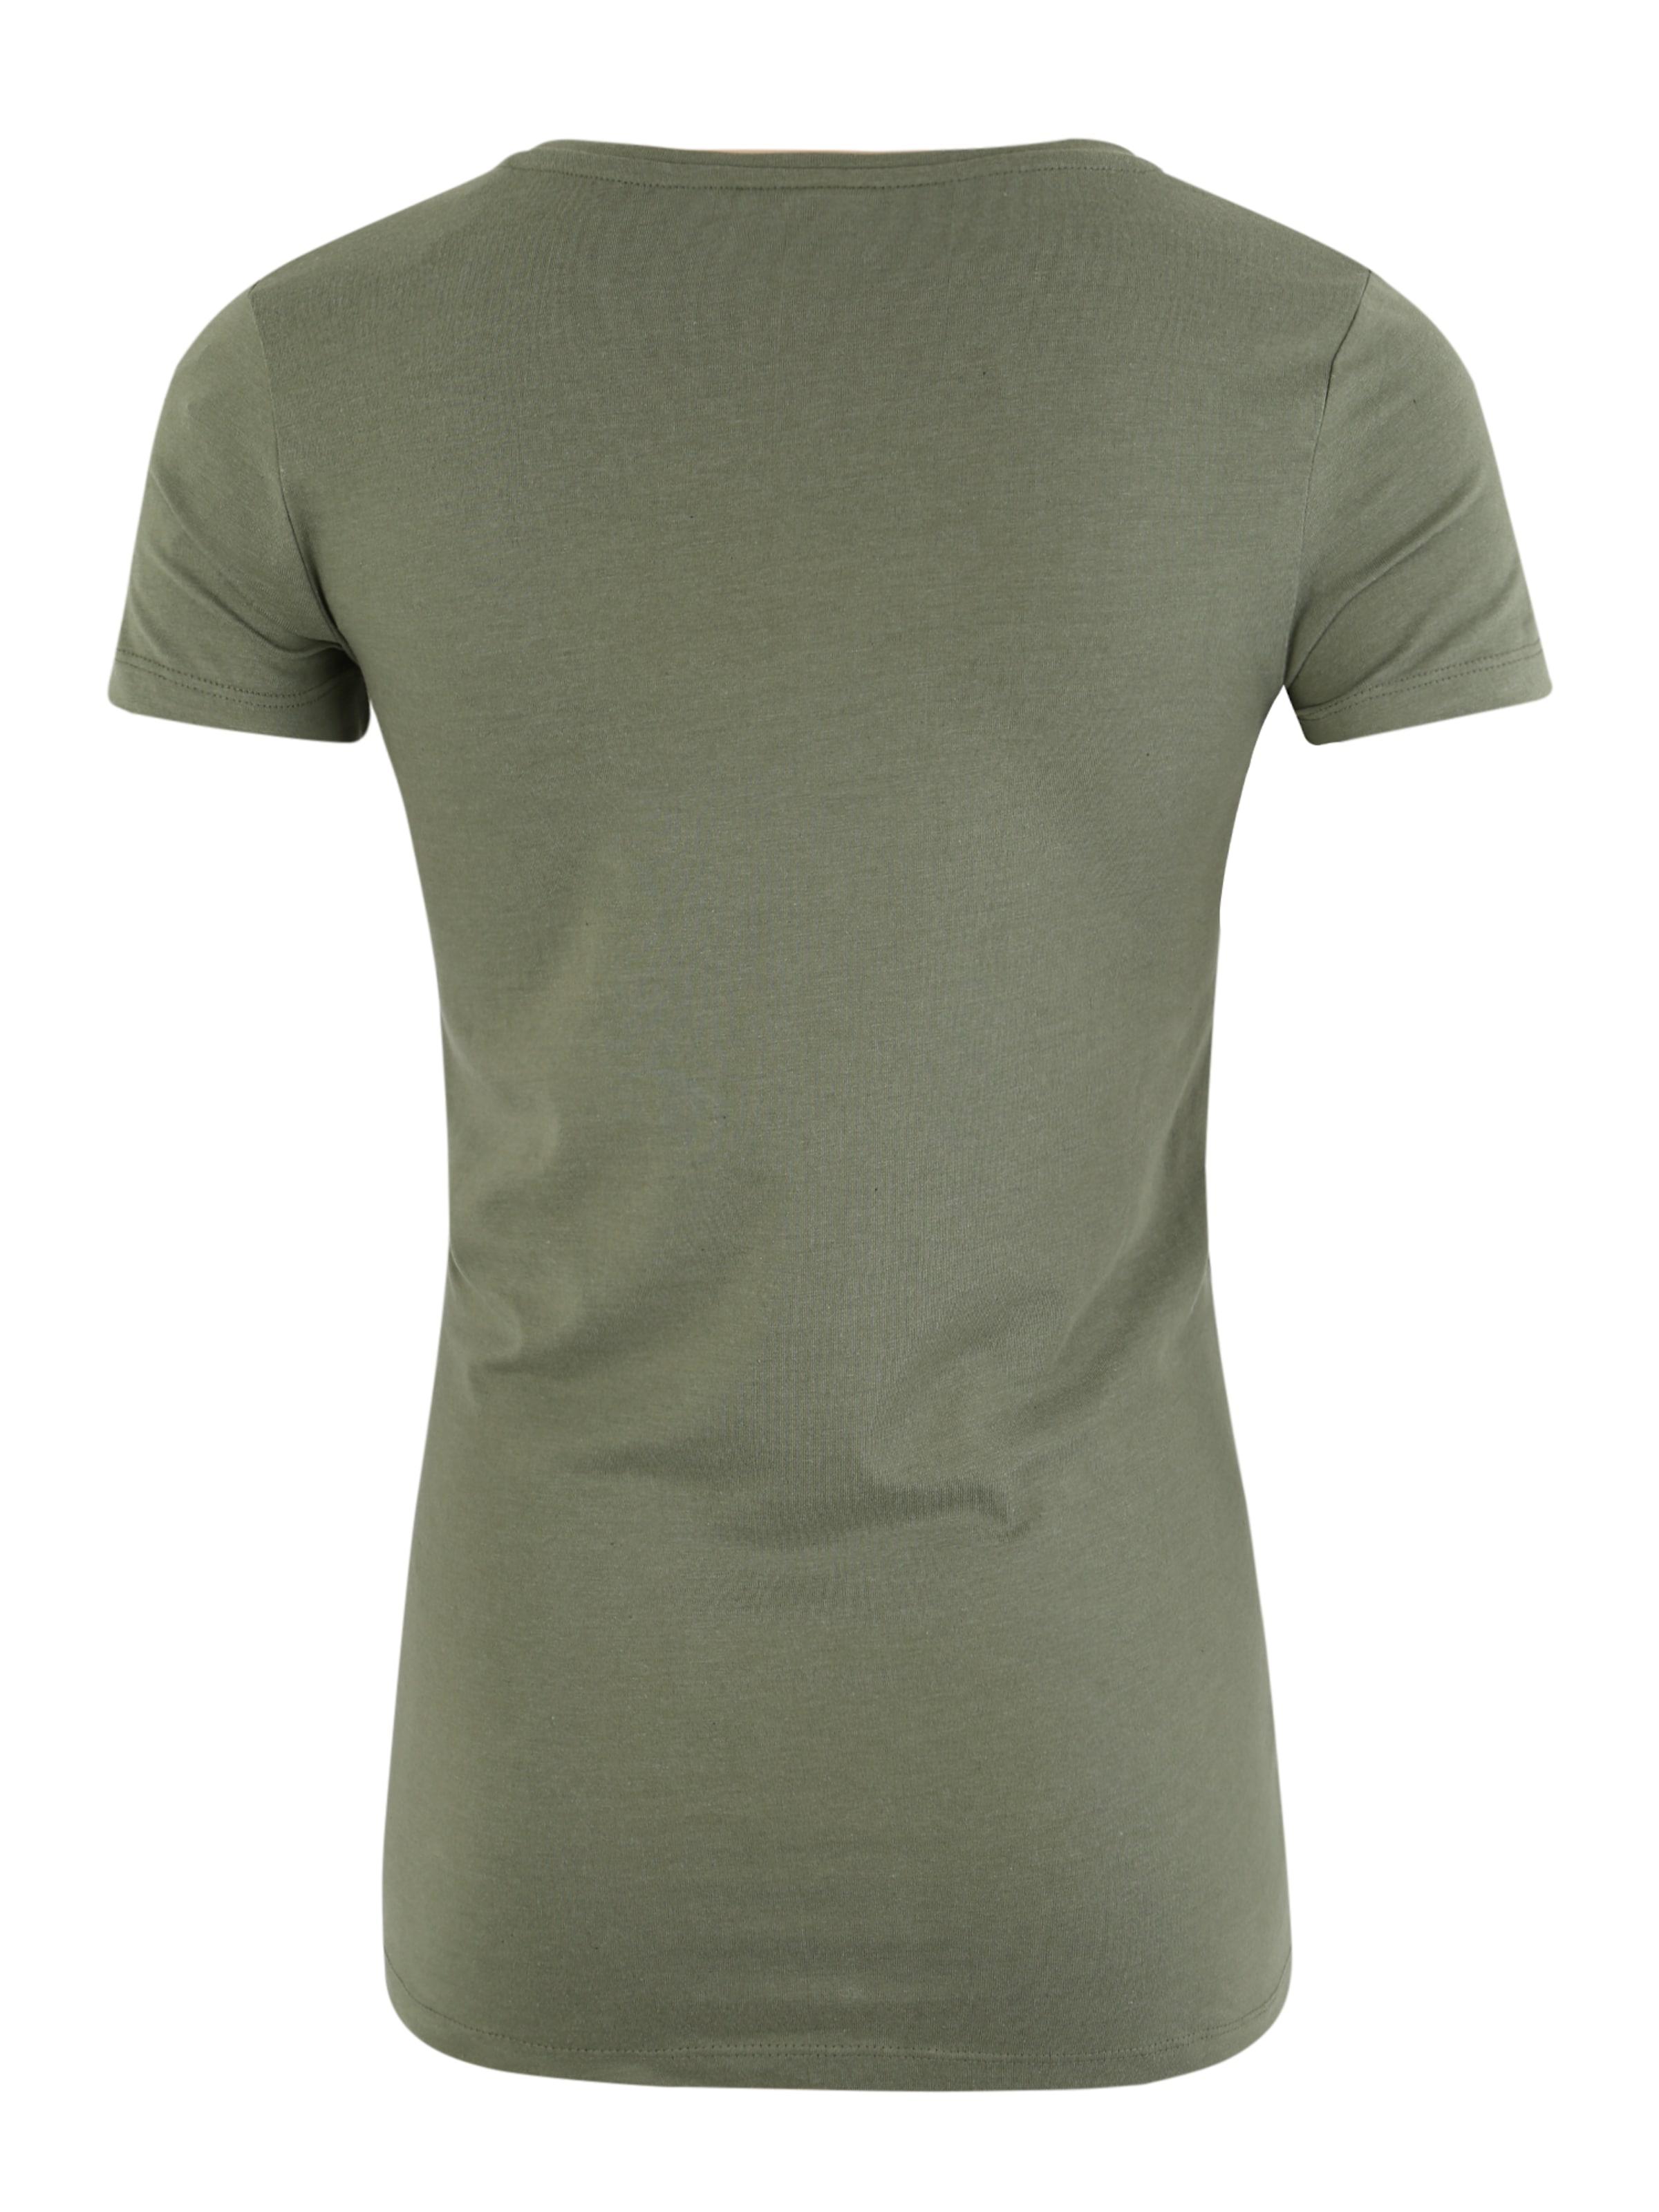 KakiBlanc Mamalicious T shirt En 'heartly' mN8nwv0